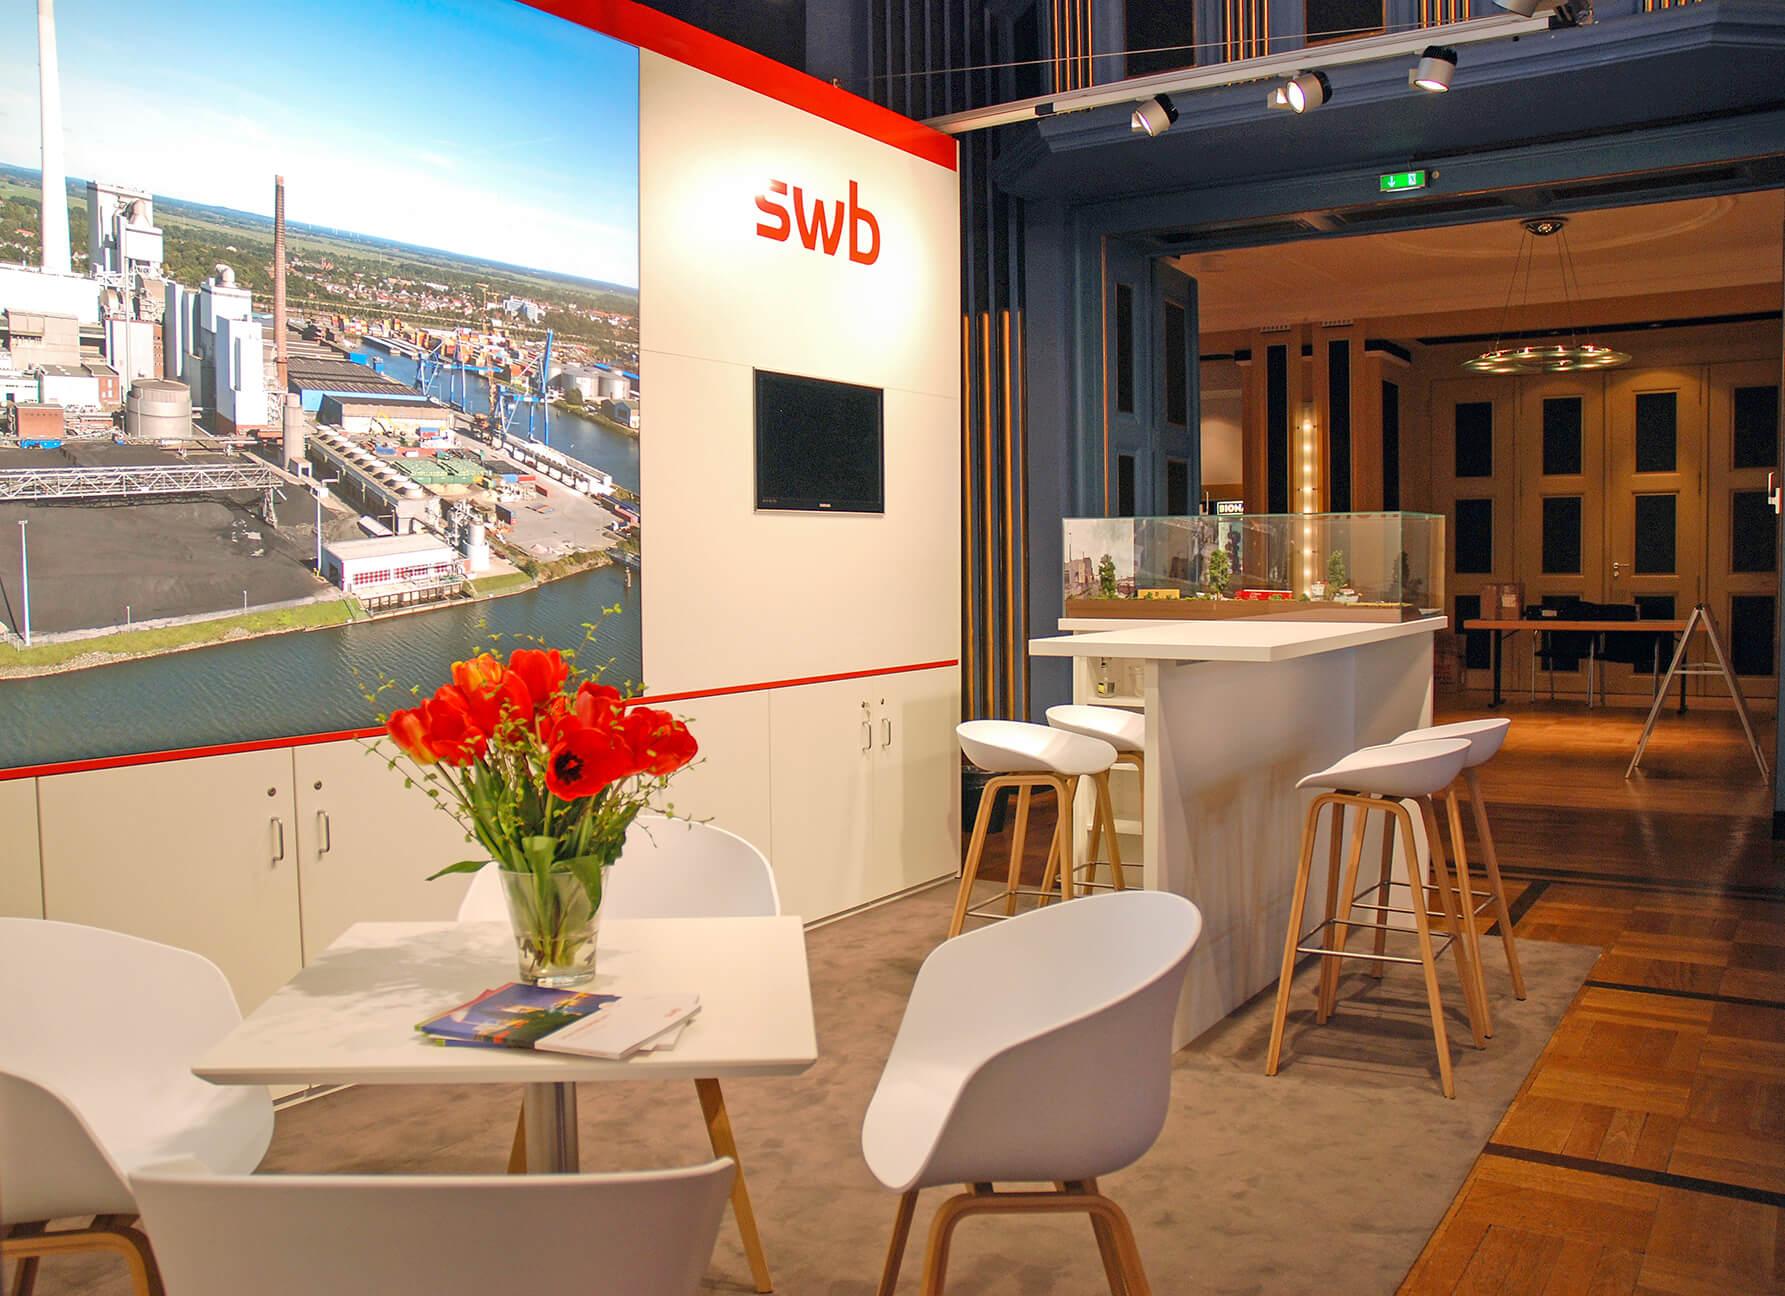 Anka Werbung - Messebau Bremen - Messebau (swb Bioenergieforum)